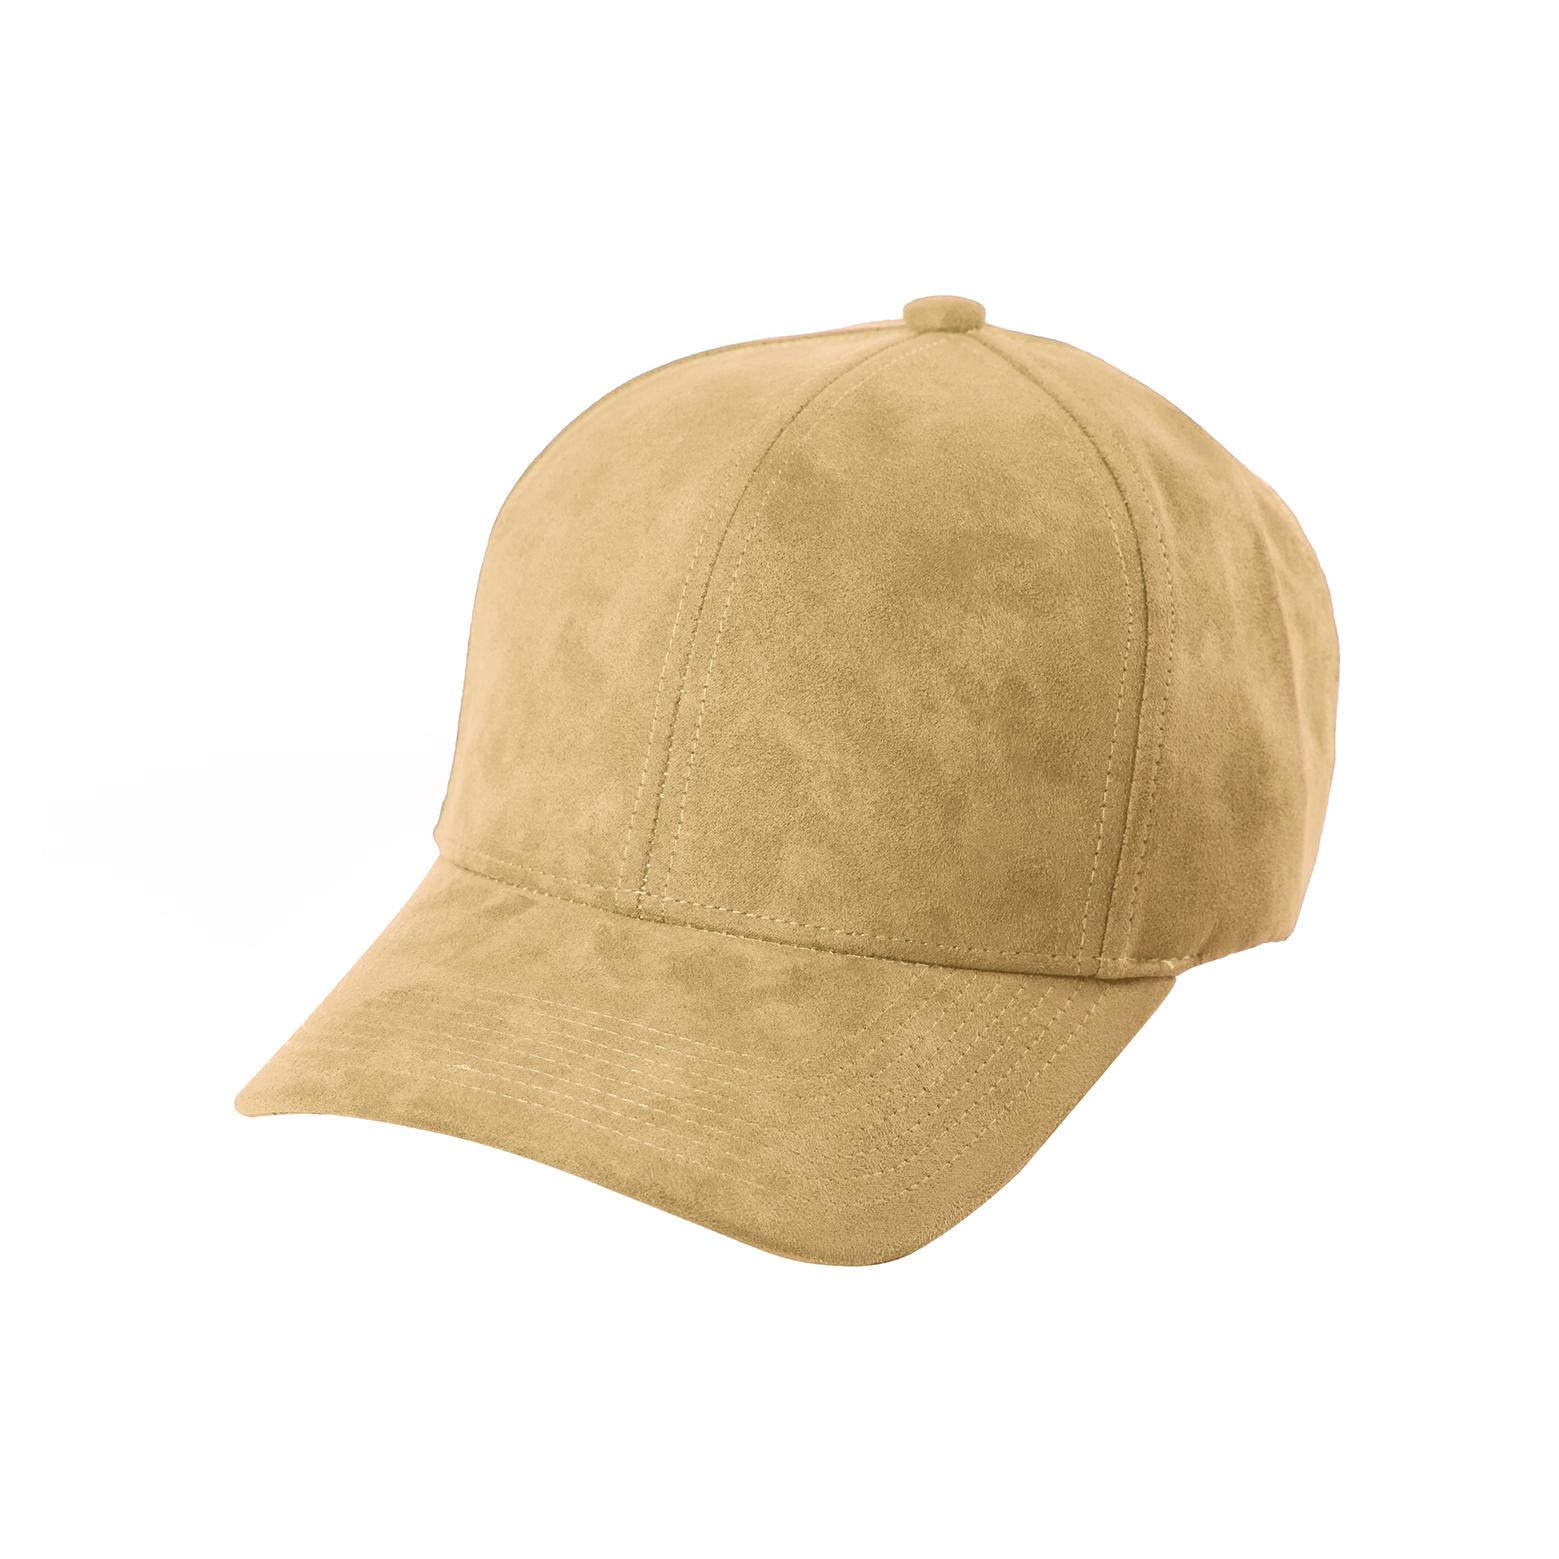 baseball-cap-beige-suede-front-side